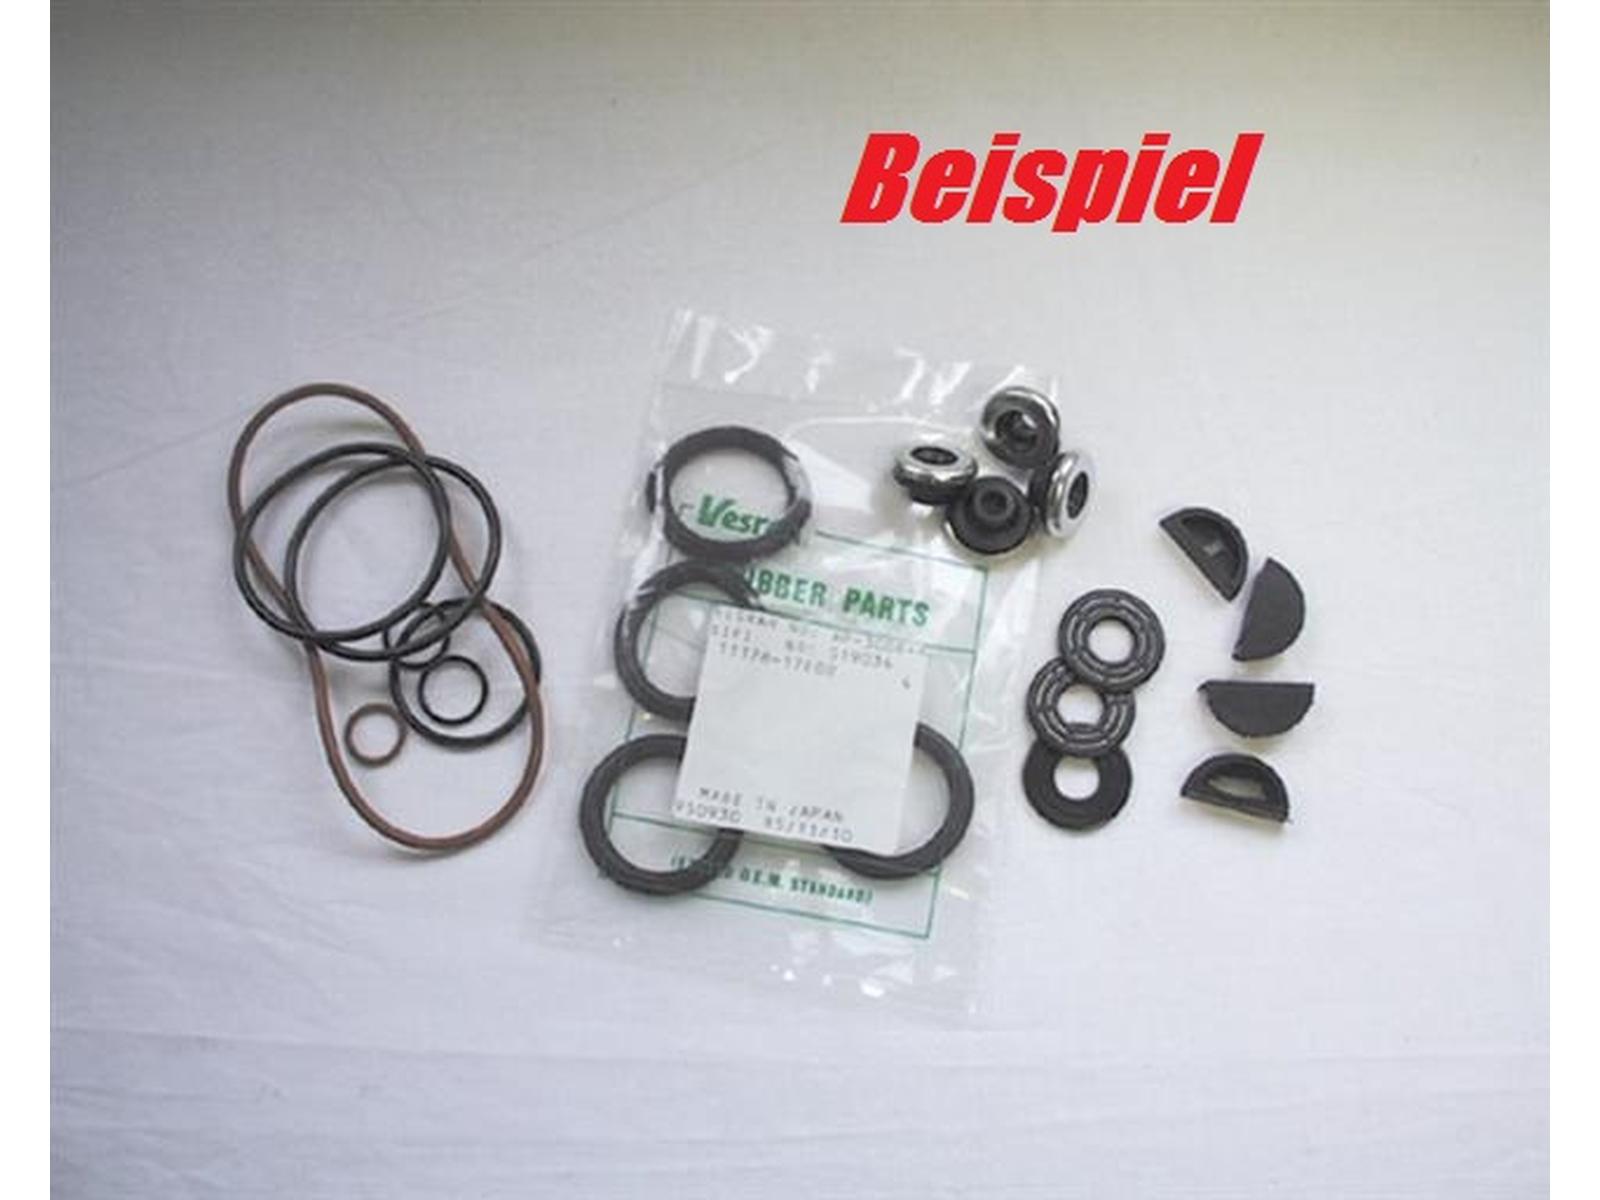 Ventildeckeldichtung Kawasaki Zr 750 C1/2 91-92